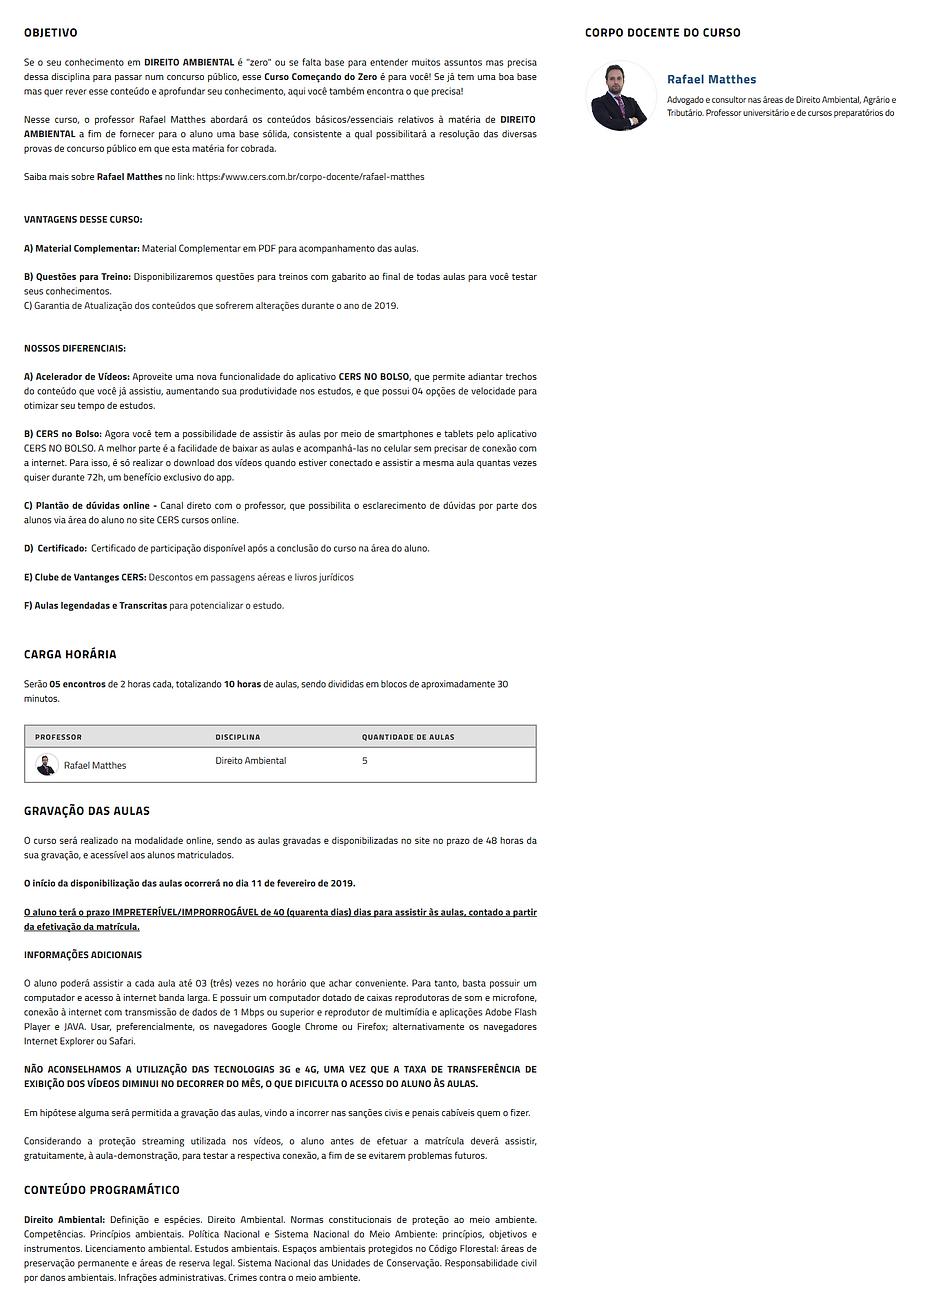 Direito Ambiental CS(23).png